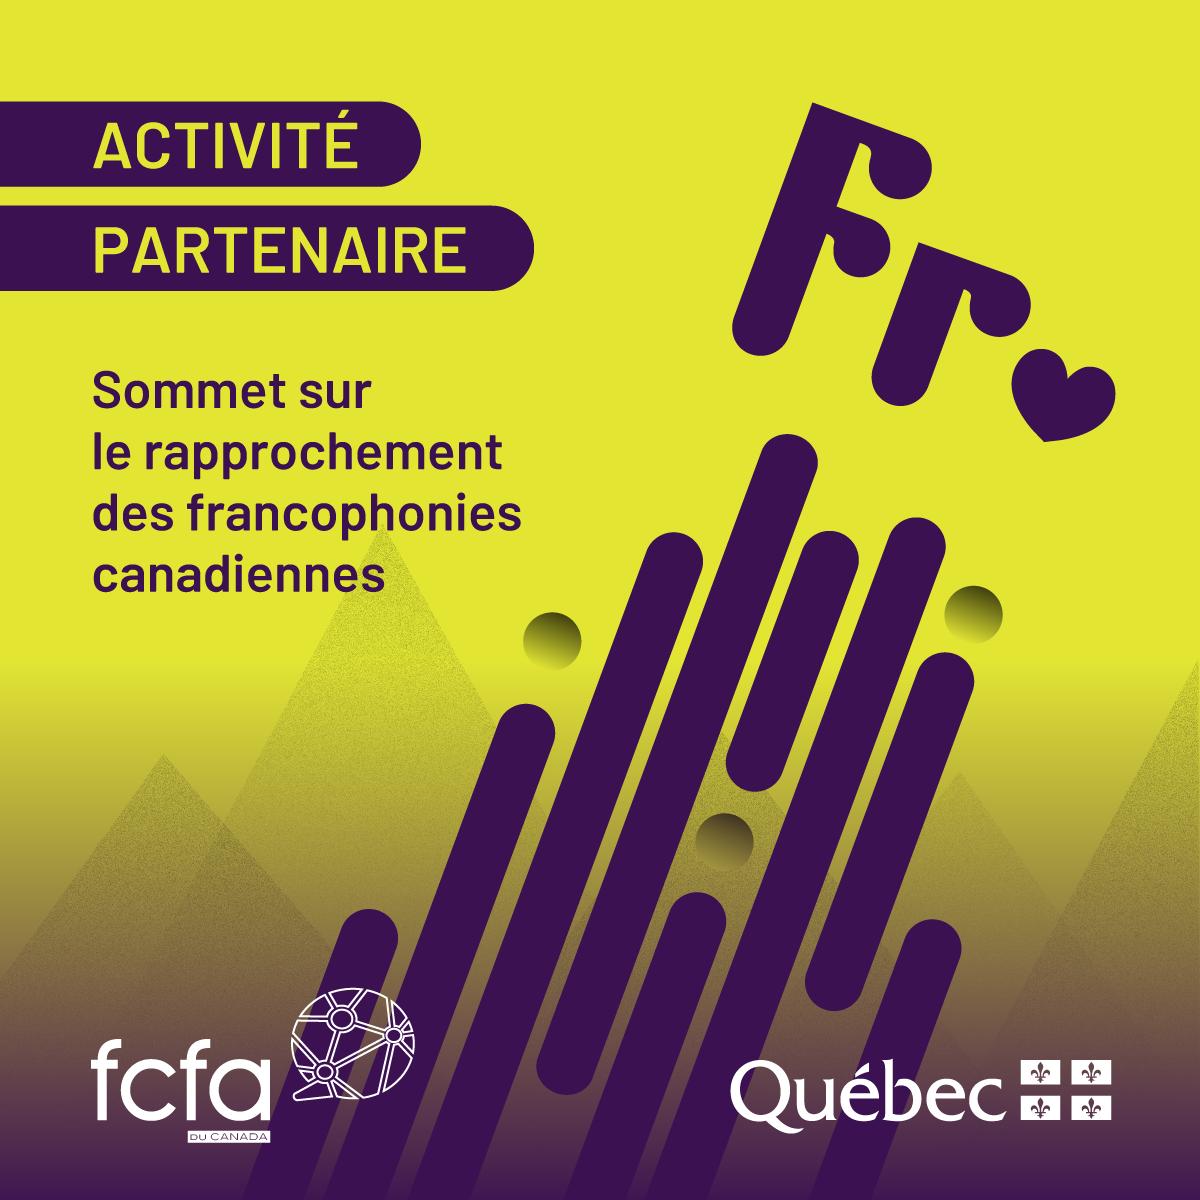 4_SommetFR_pub-medias_activite-partenaire